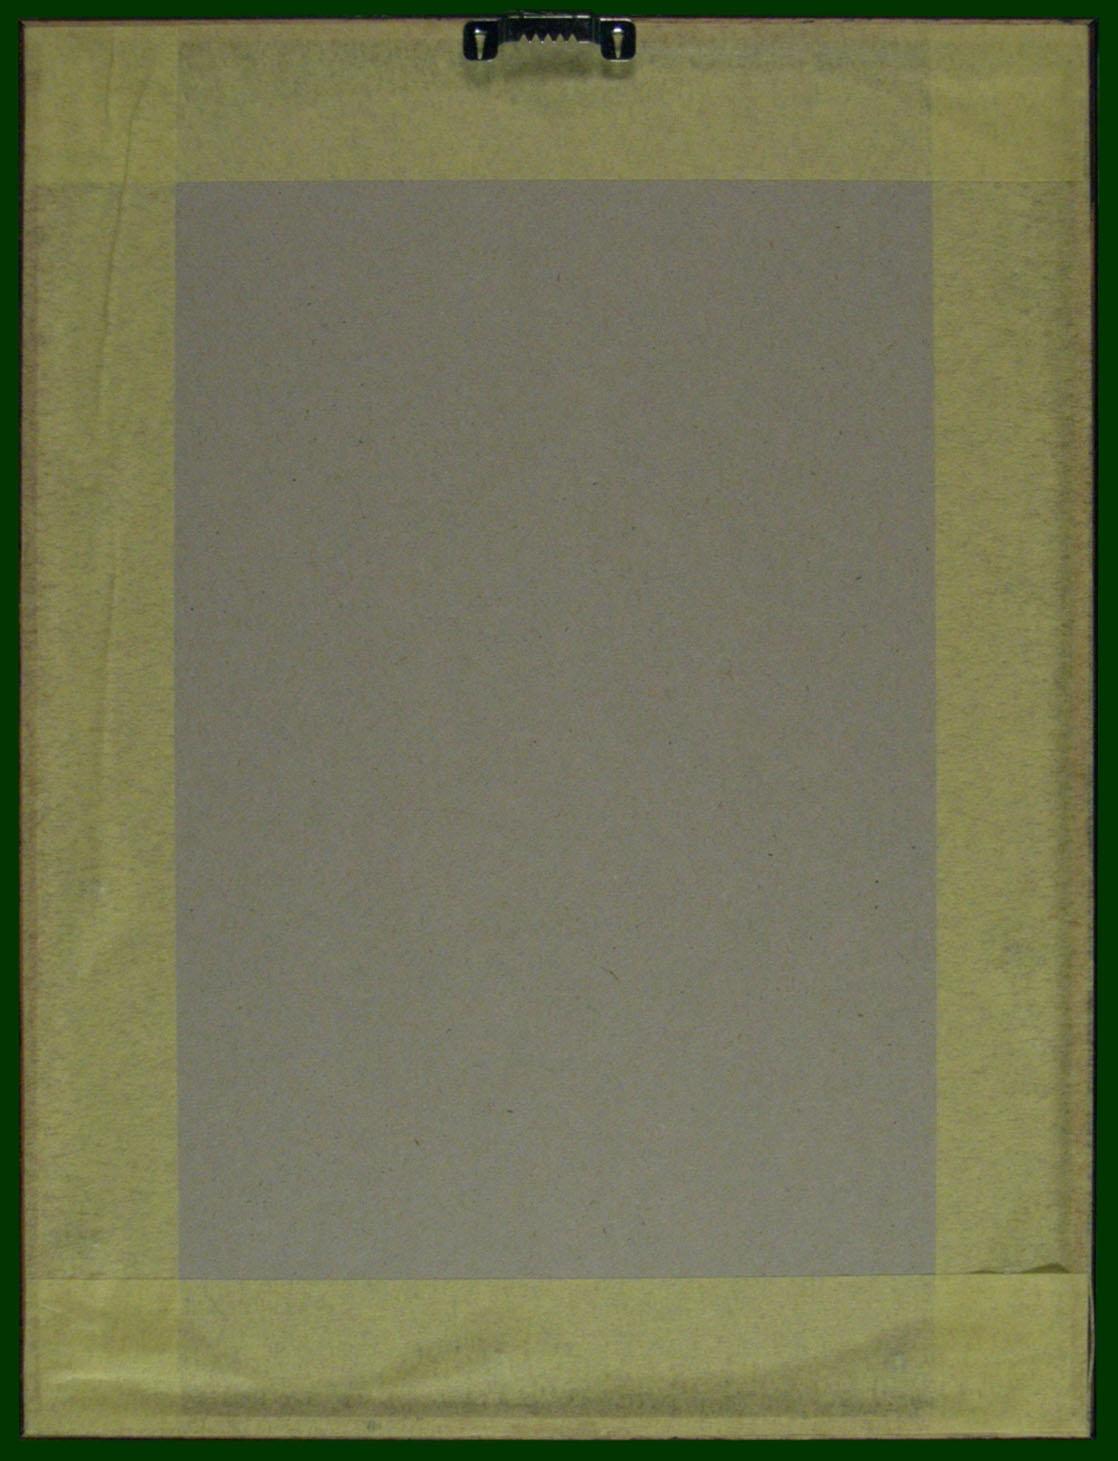 095-004hat.JPG (1118×1461)